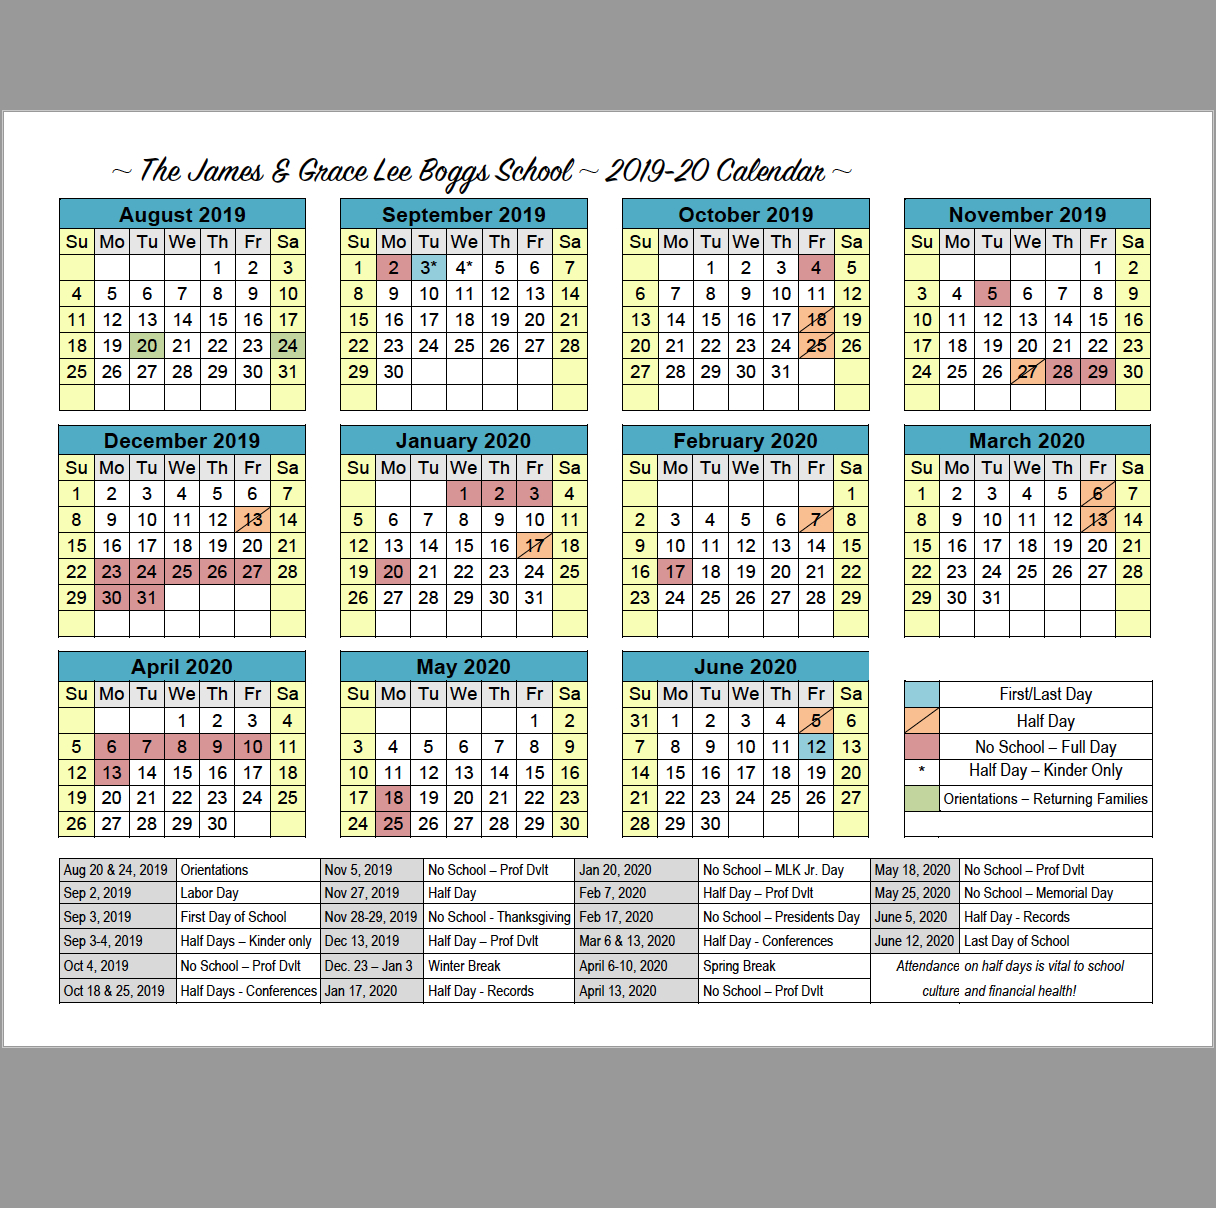 School Calendar | Boggs Educational Center U Michigan Calendar 2019